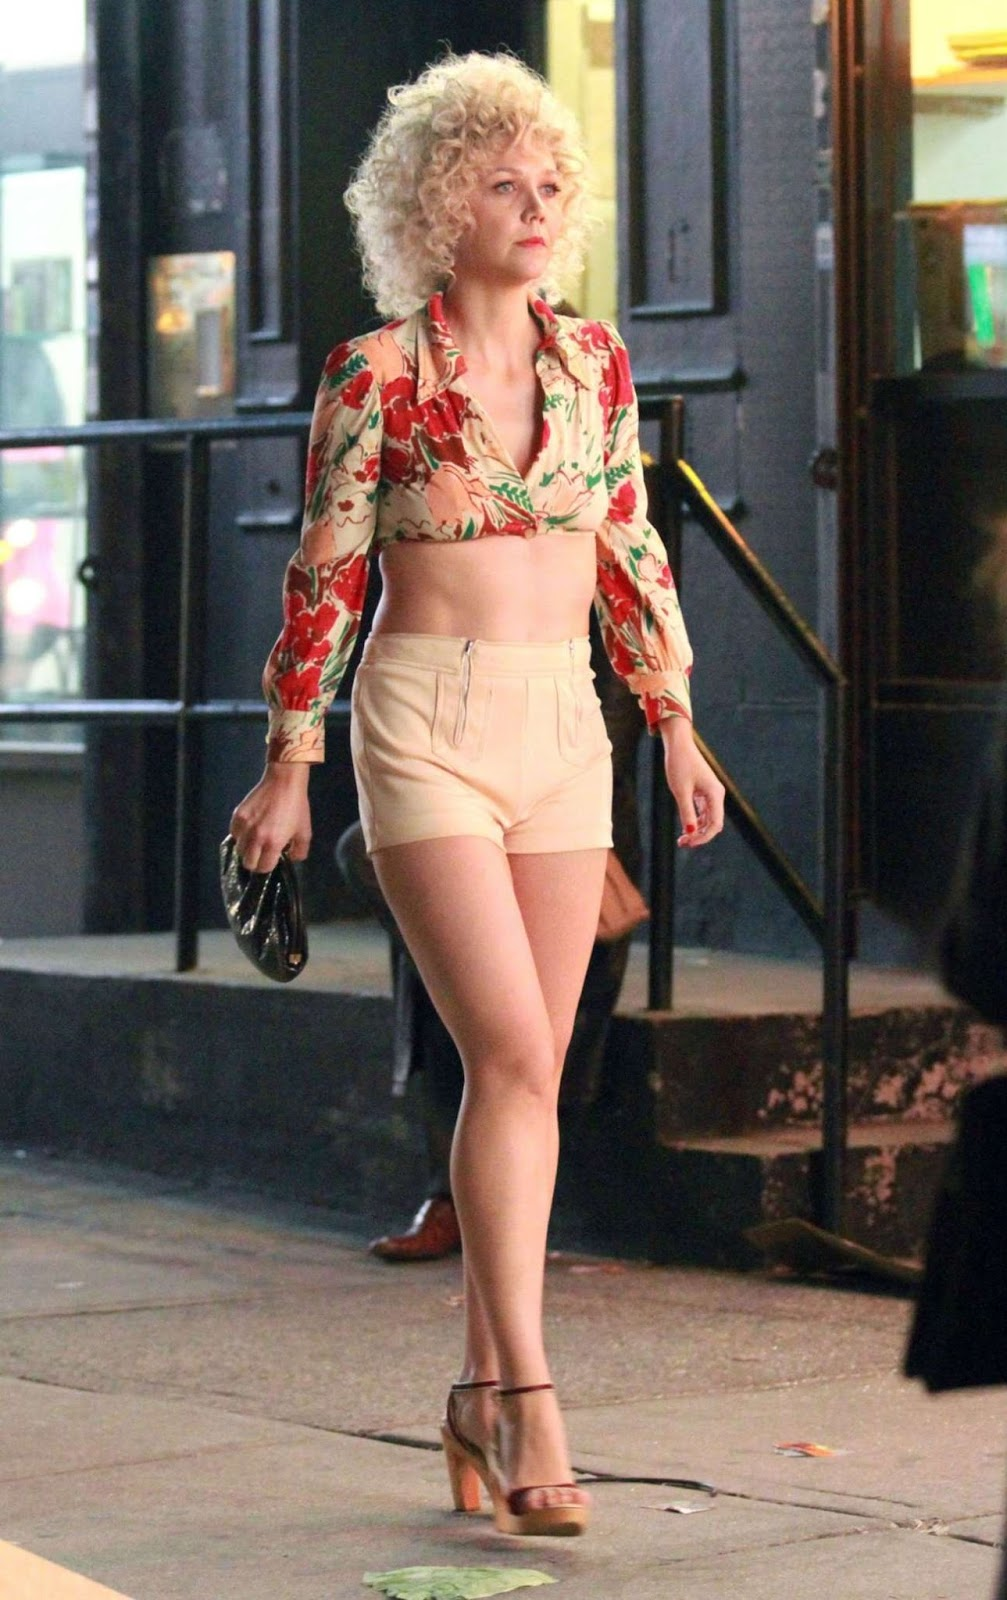 Paparazzi Alena Vodonaeva nude (62 photo), Tits, Cleavage, Twitter, in bikini 2019